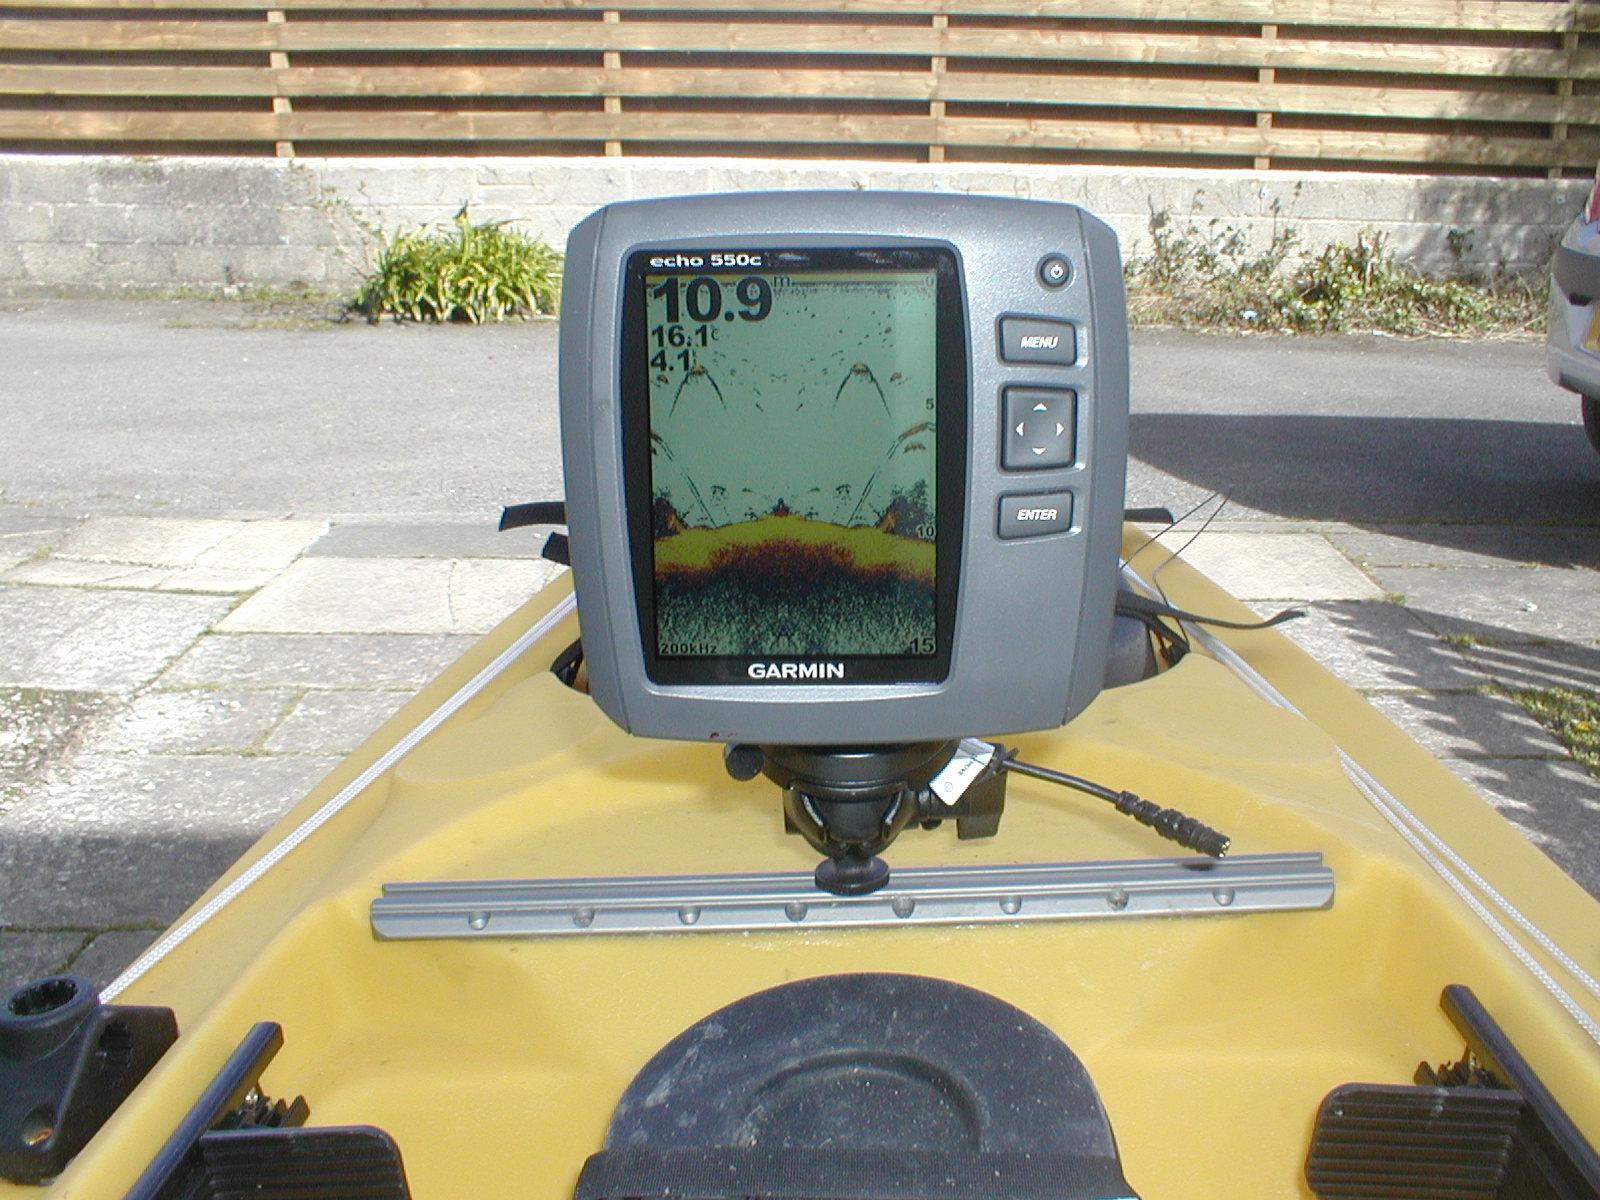 Cornish Shore And Kayak Fisherman Fitting A Fish Finder Garmin 300c Fishfinder Wiring Diagram Echo 550c